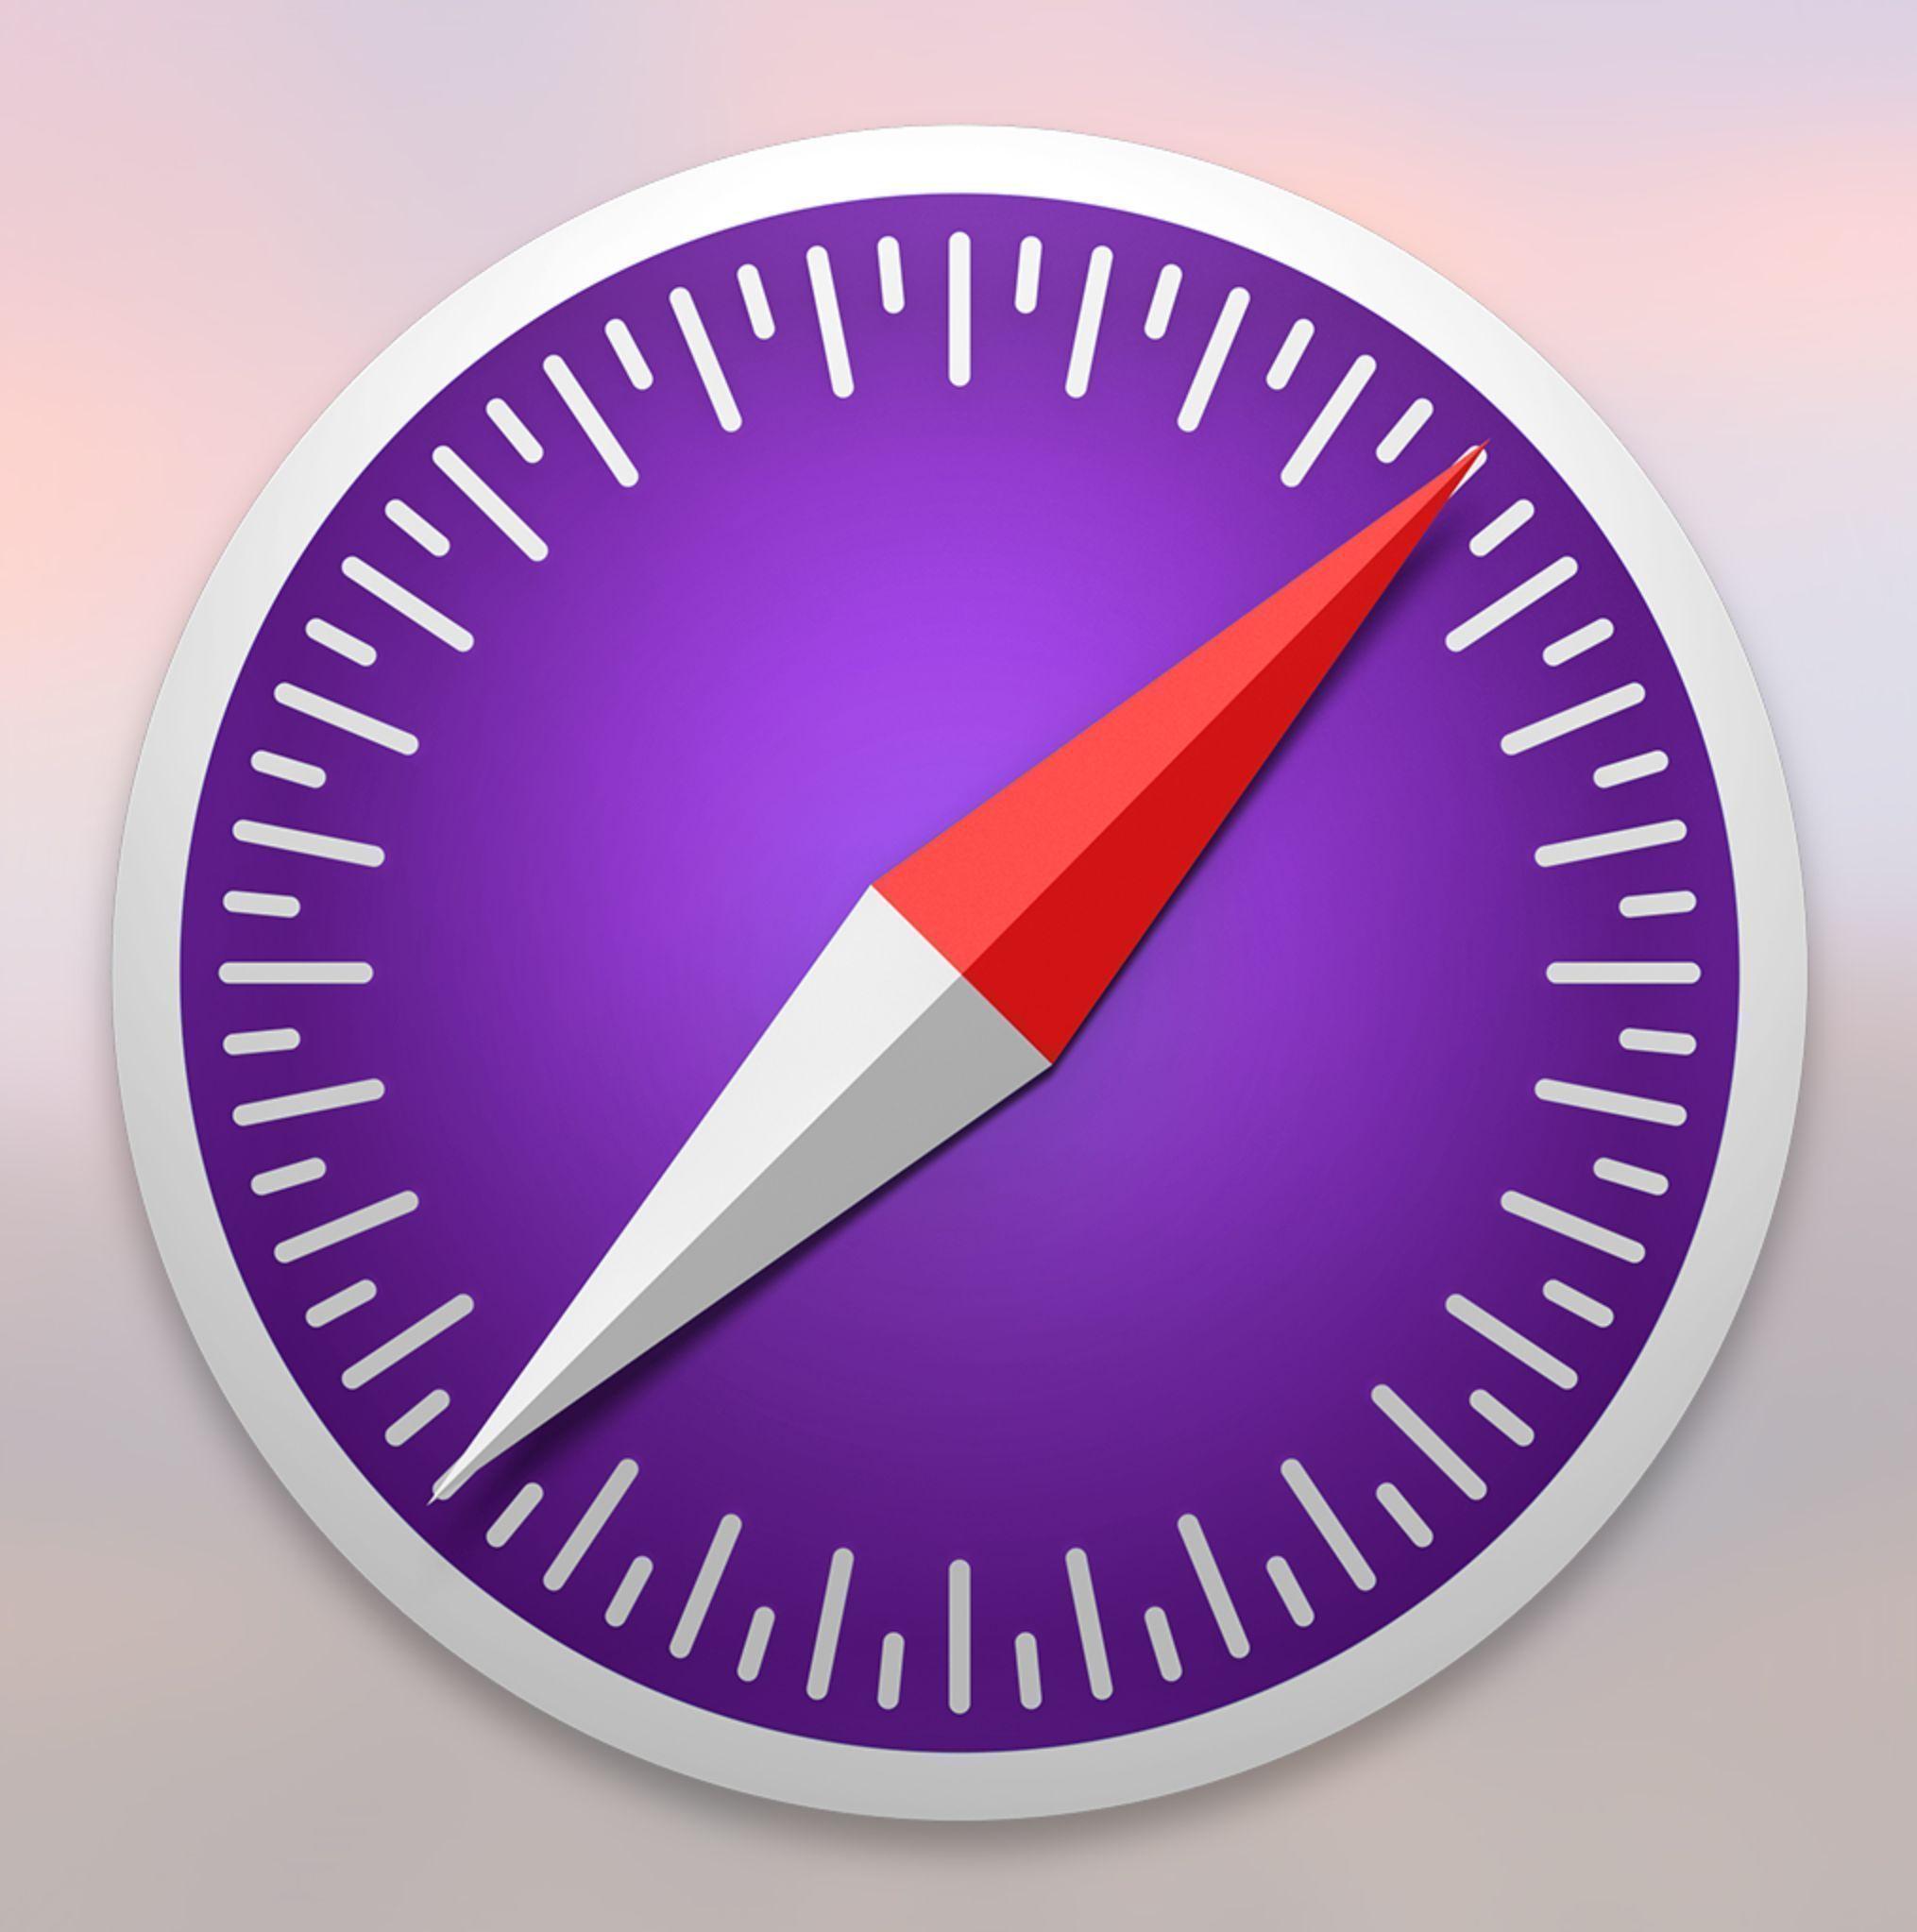 Apple tests support for USB security keys on Safari